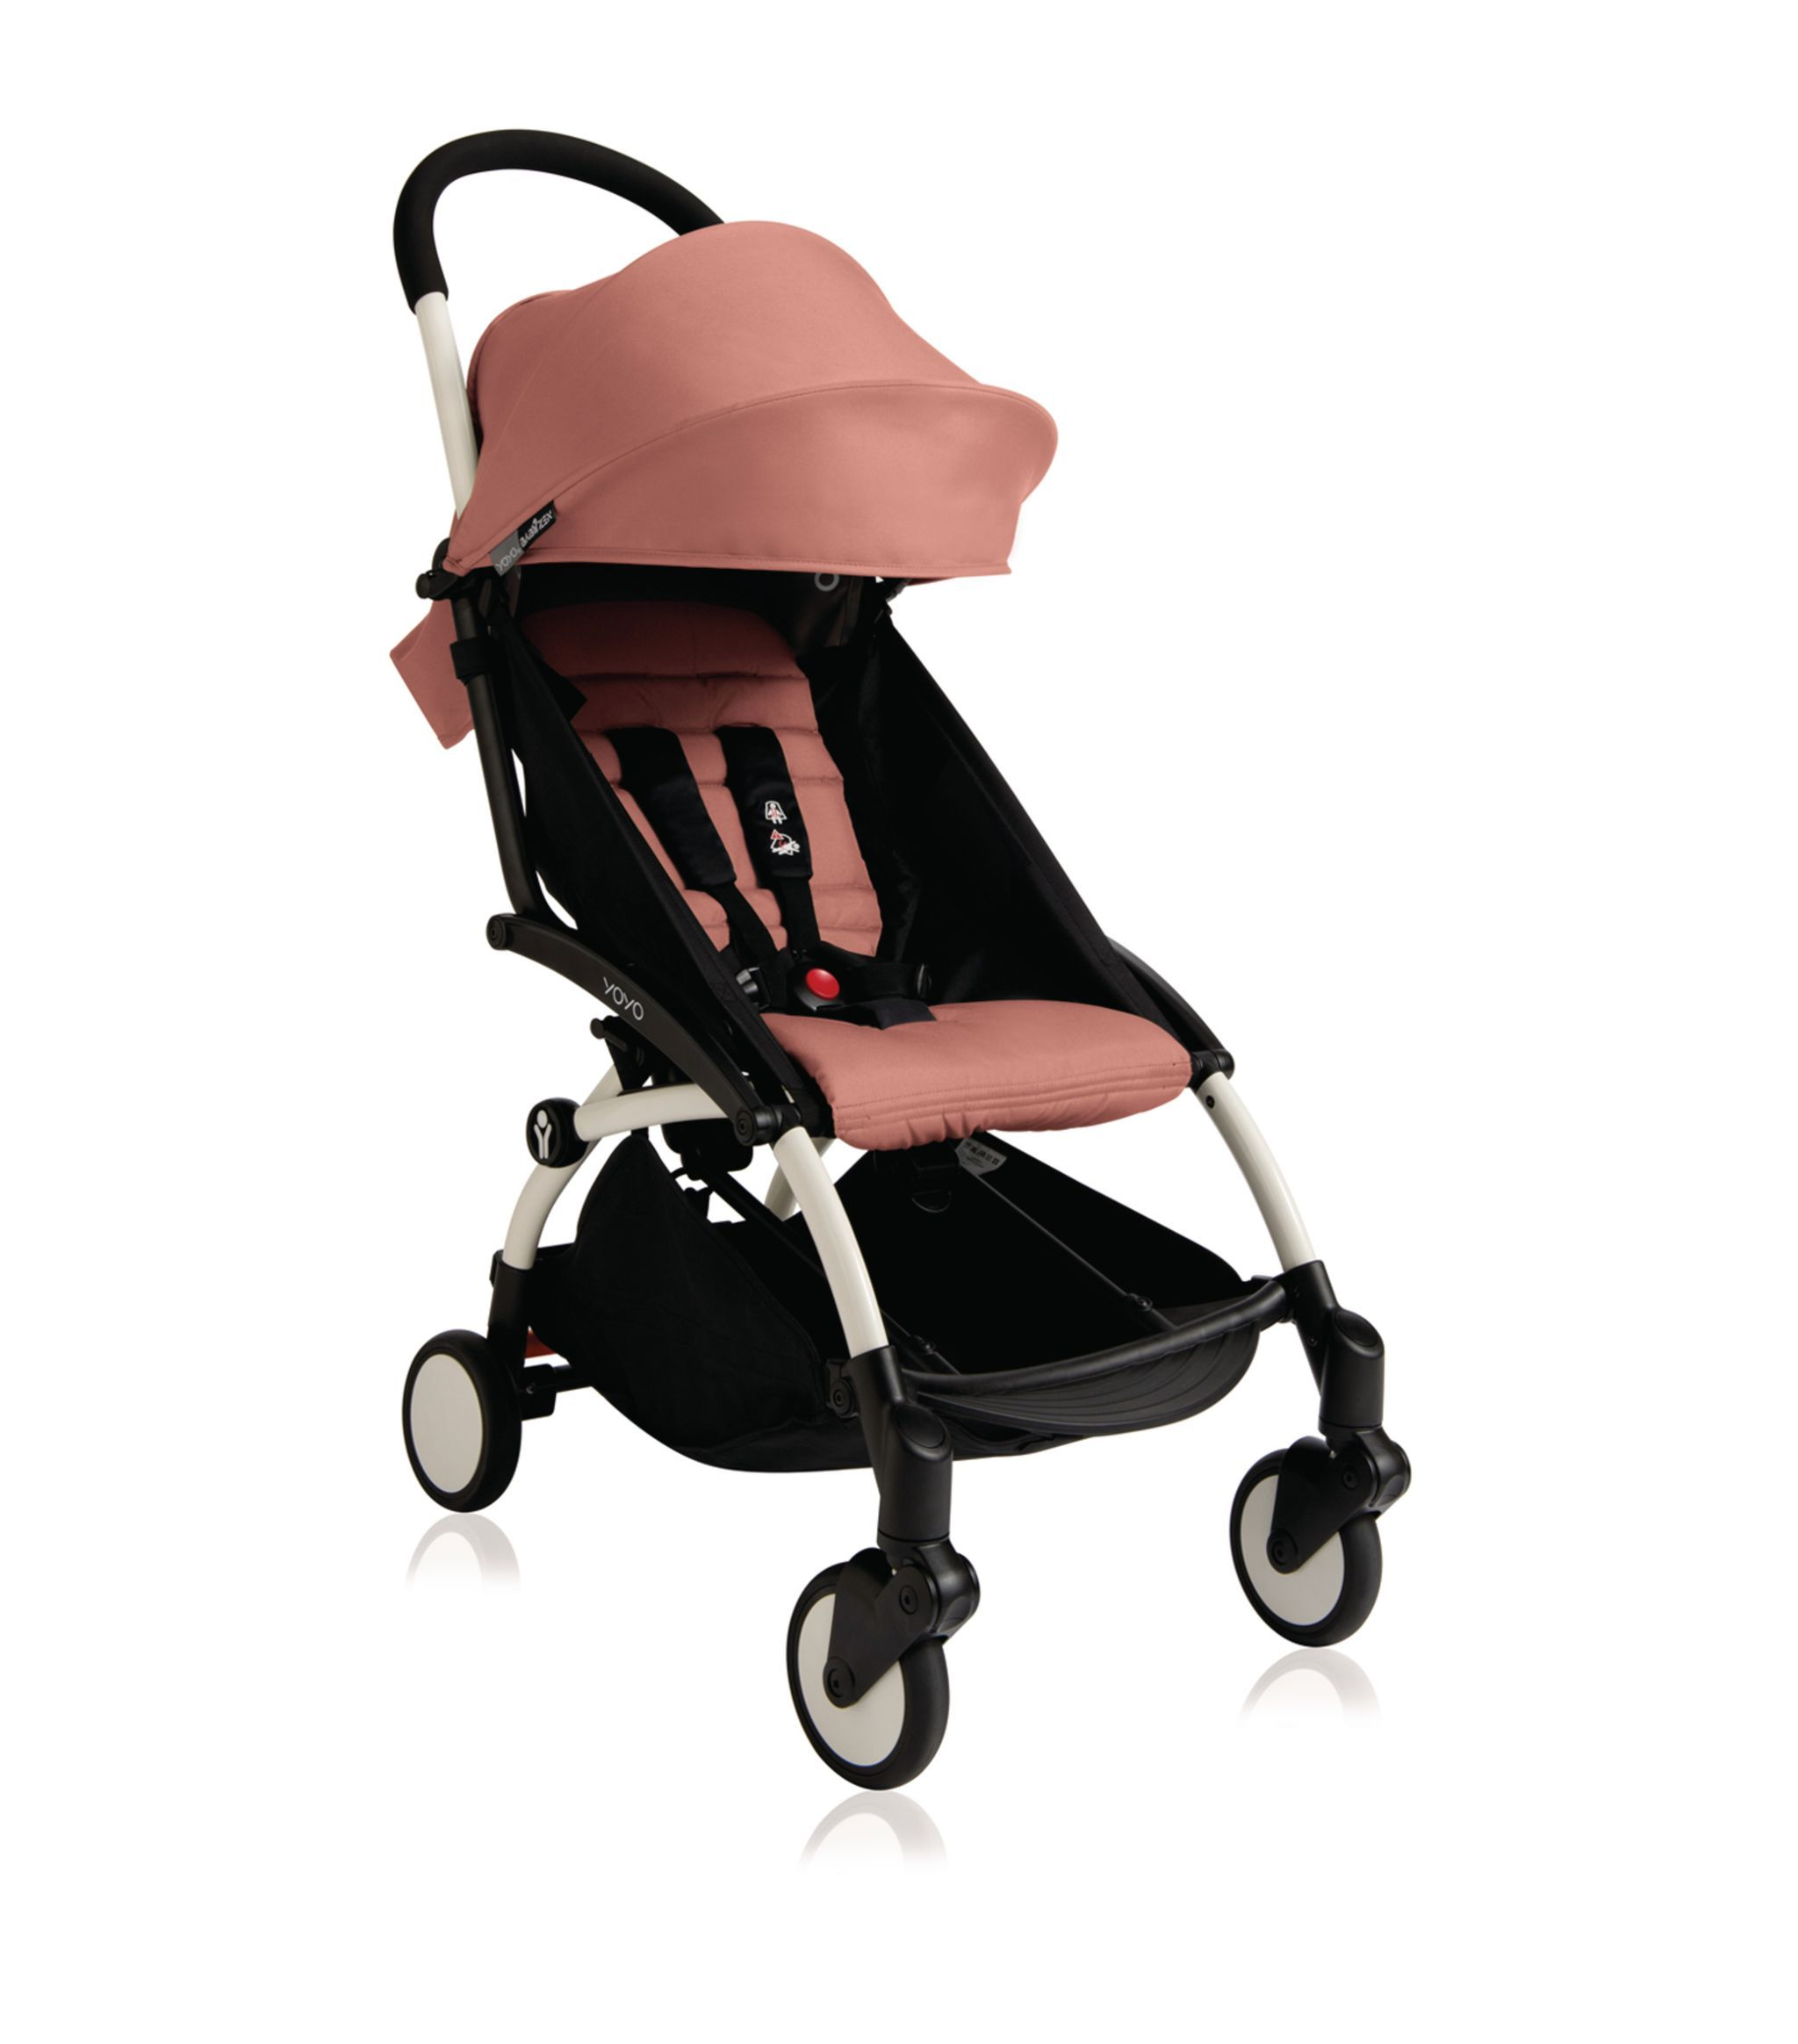 Babyzen YOYO 6 Stroller AD , SPONSORED, Babyzen, YOYO